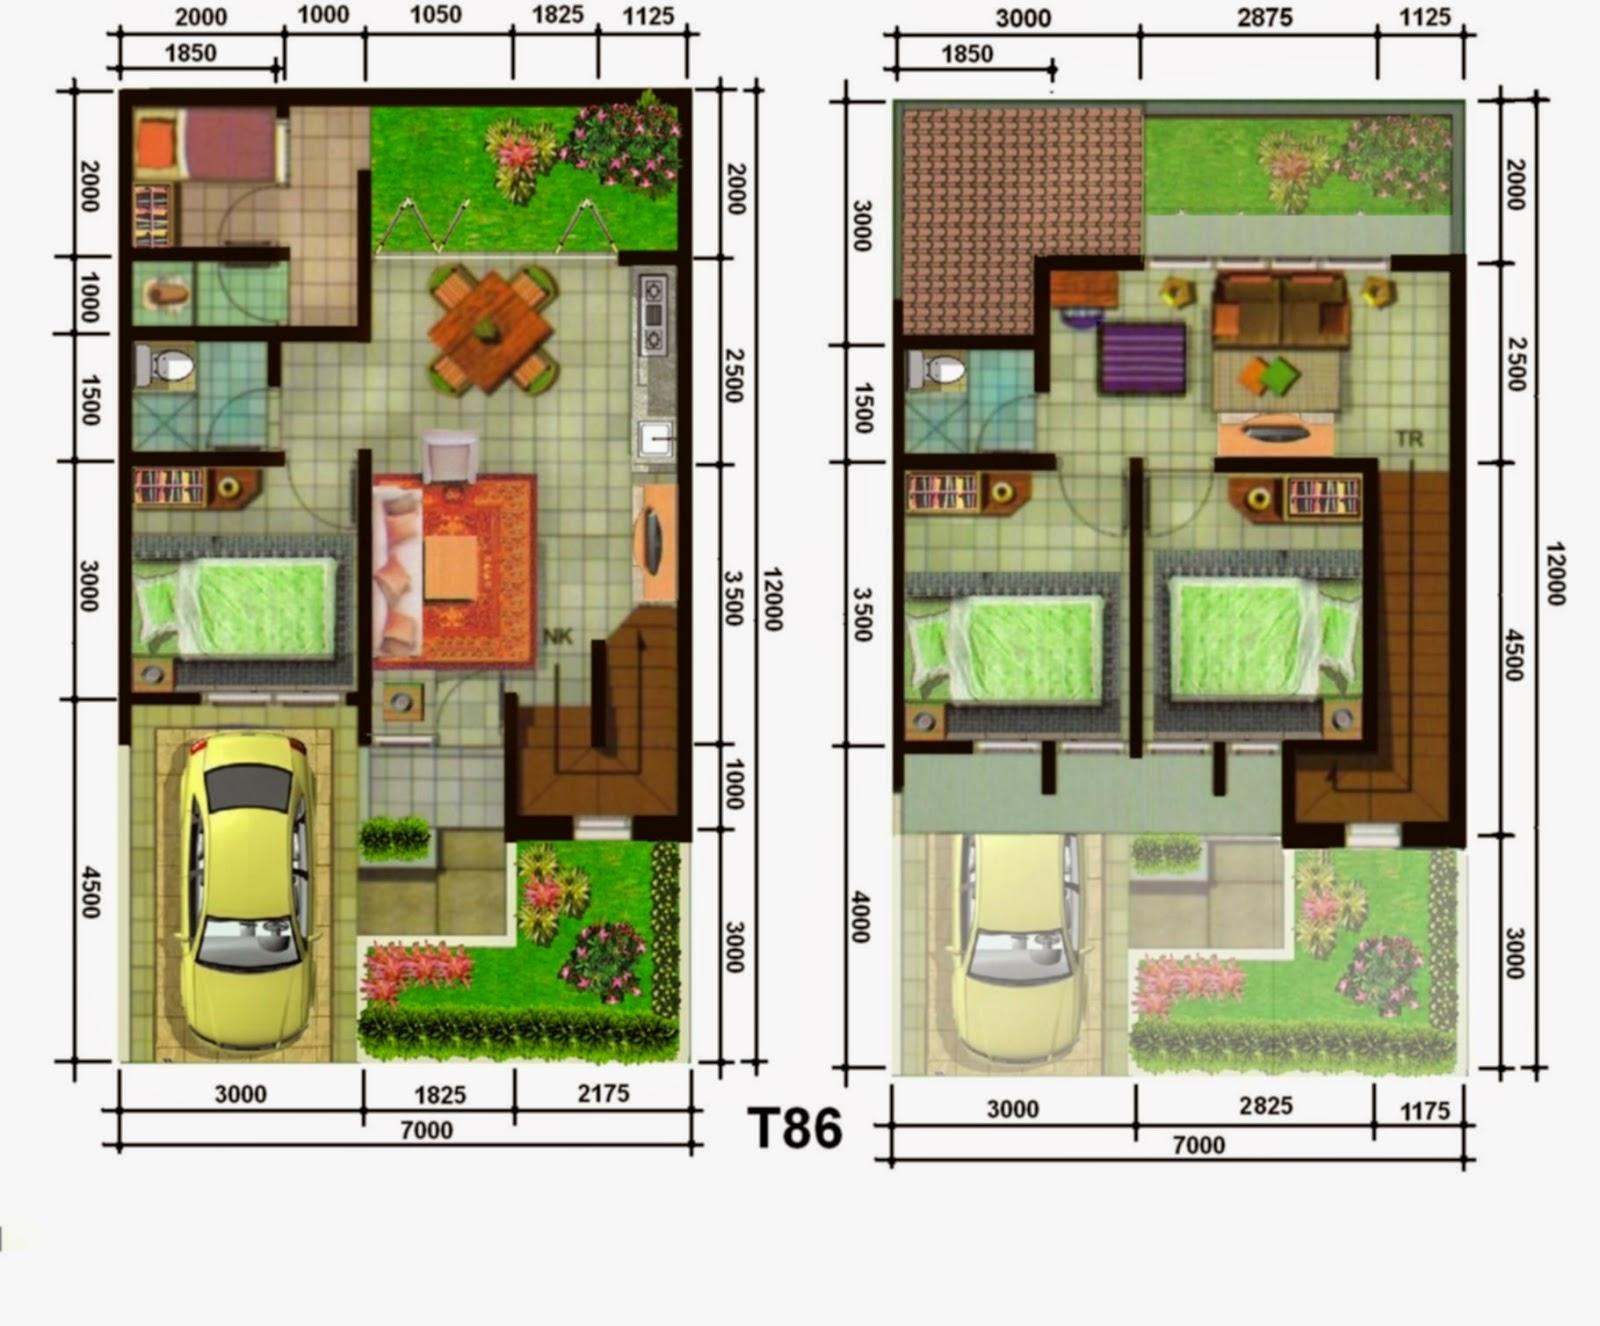 Denah Rumah Minimalis 1 Lantai Ukuran 7x12